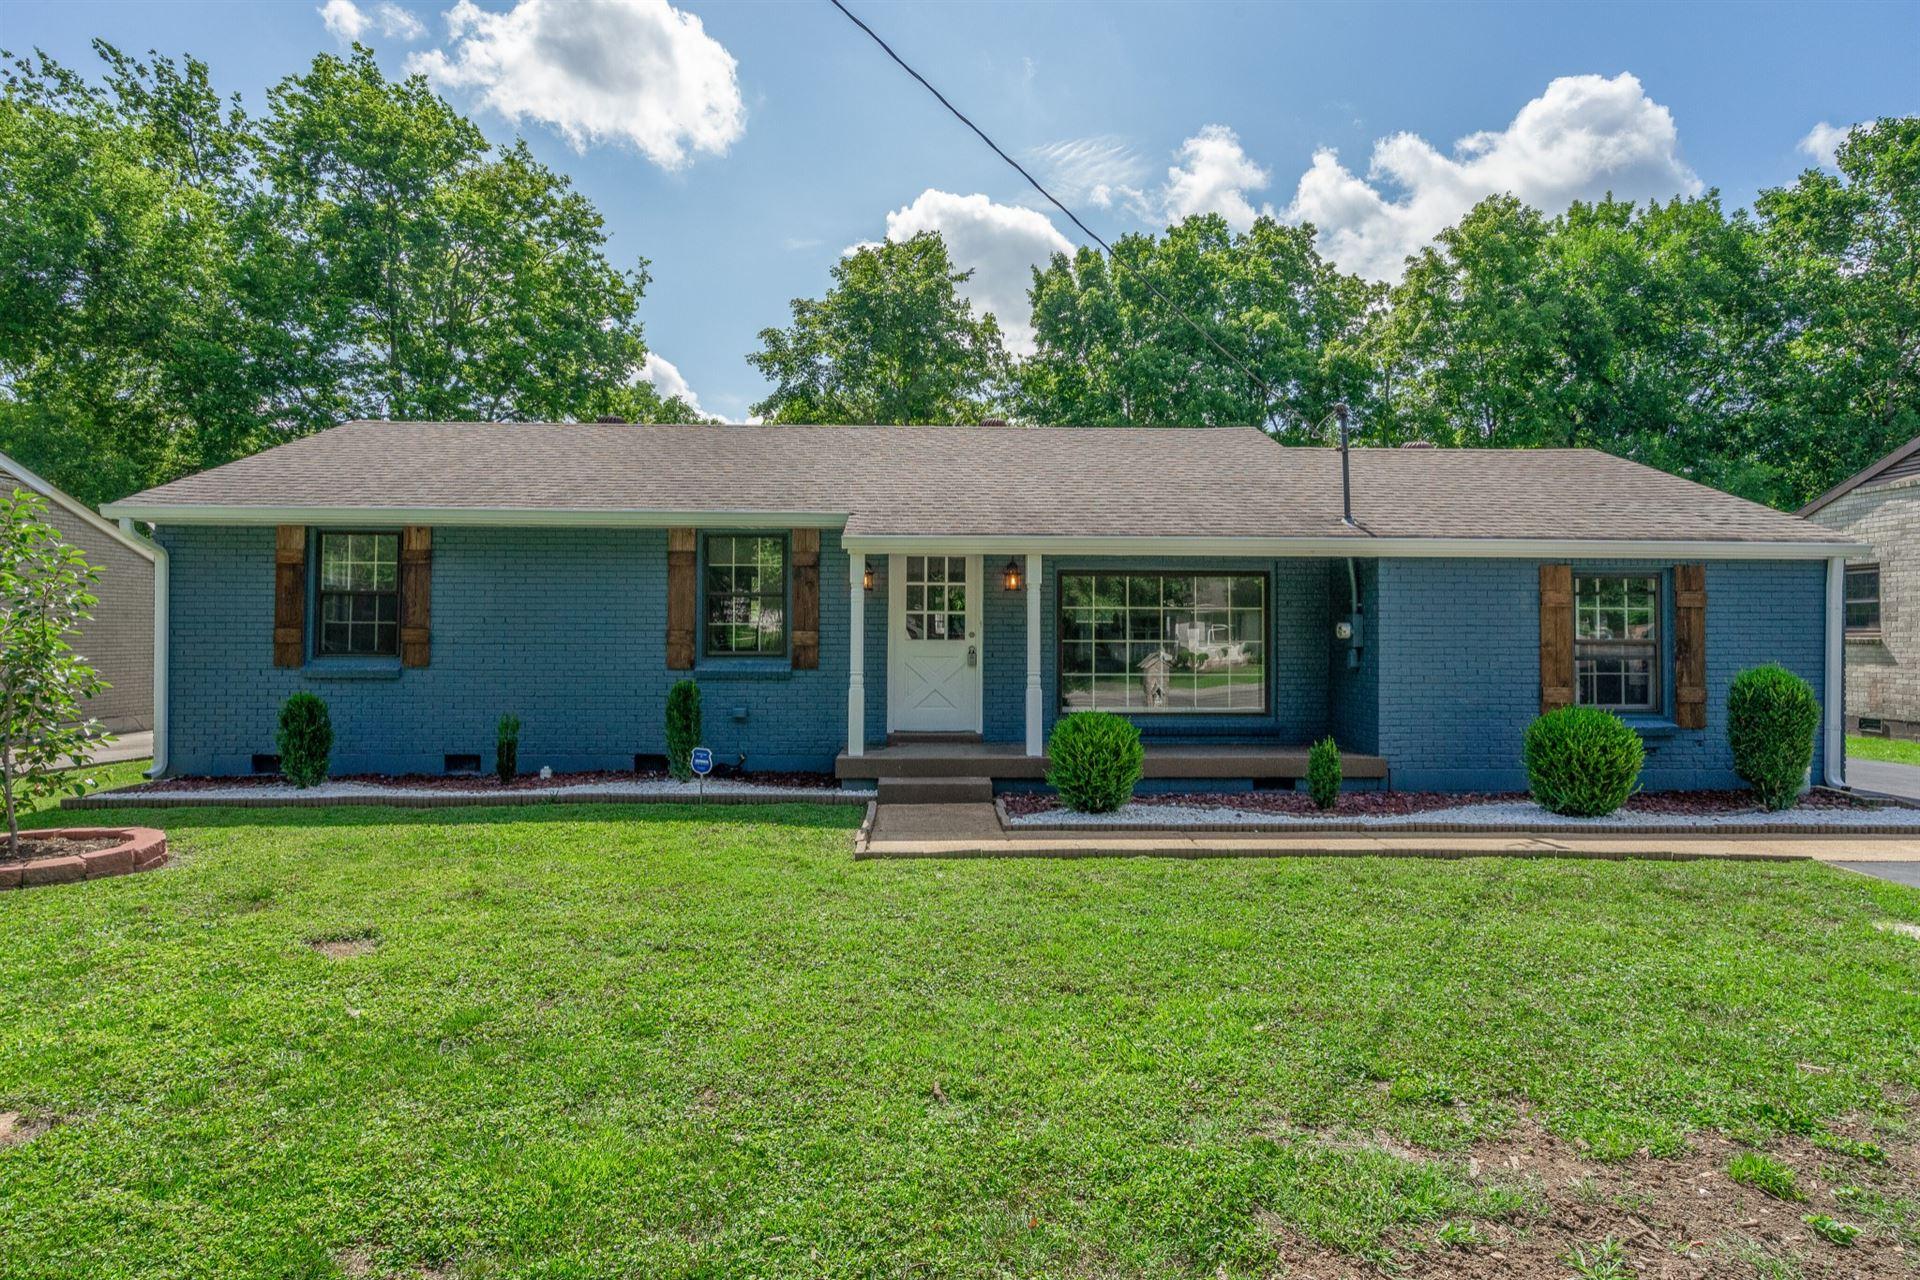 229 Elysian Fields Rd, Nashville, TN 37211 - MLS#: 2264923